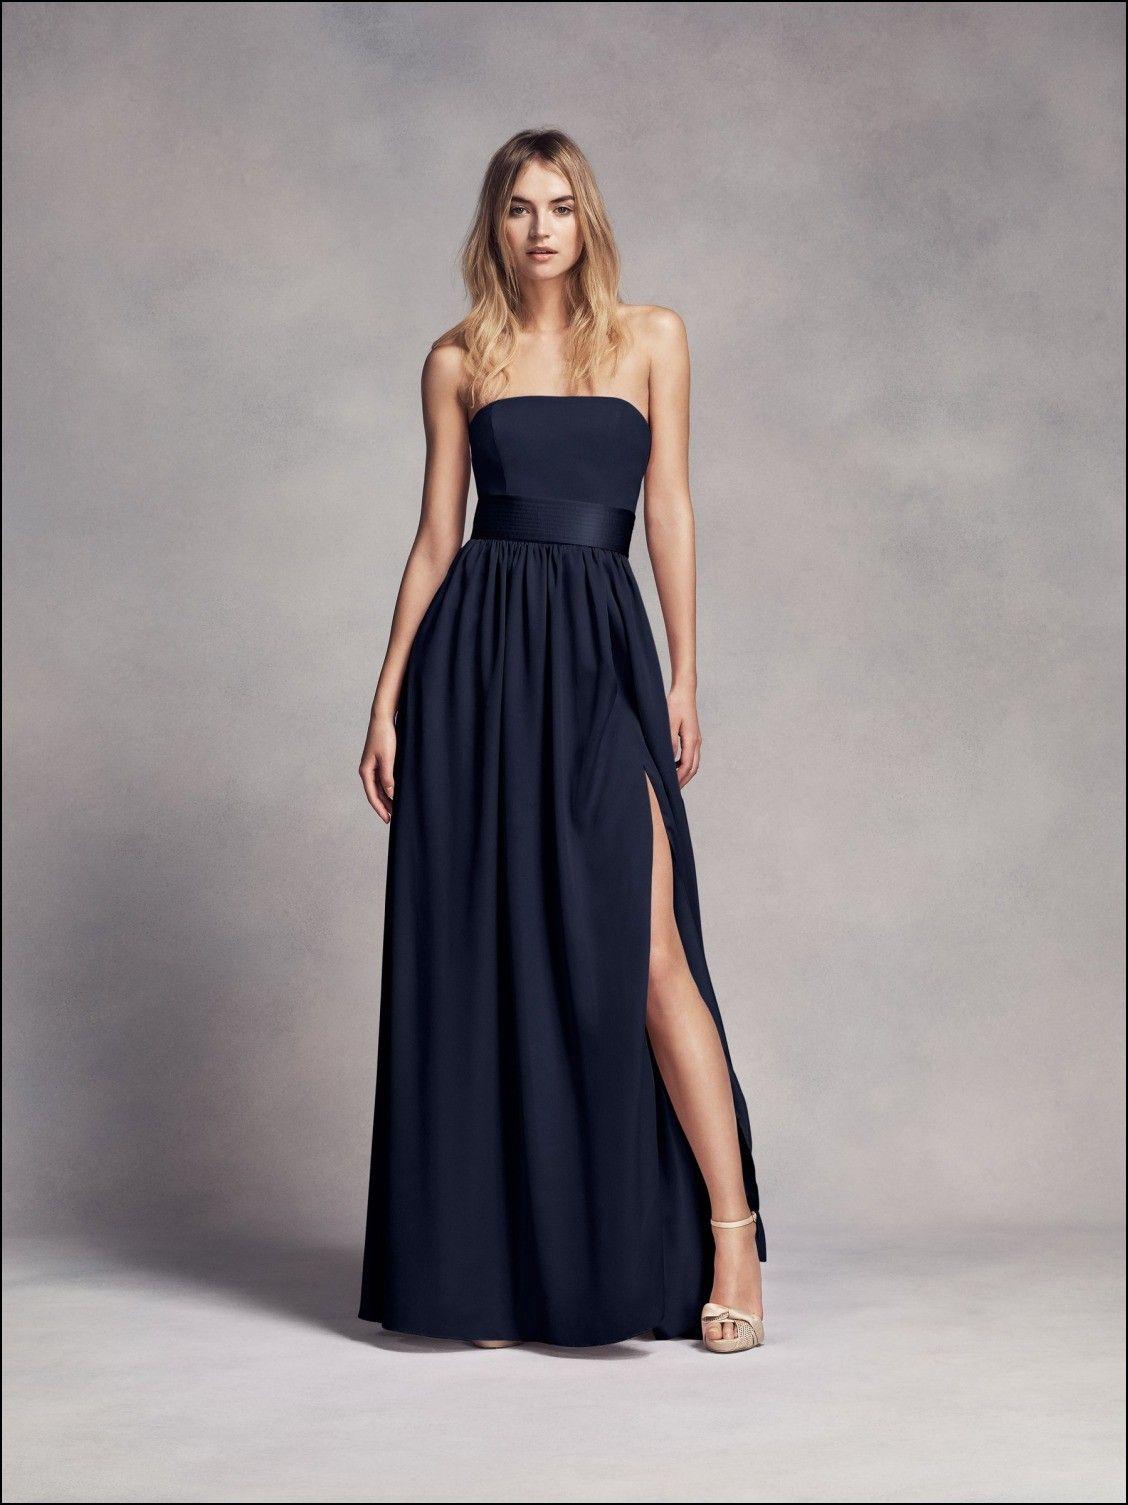 Vera wang midnight blue bridesmaid dress dresses and gowns ideas vera wang midnight blue bridesmaid dress ombrellifo Gallery